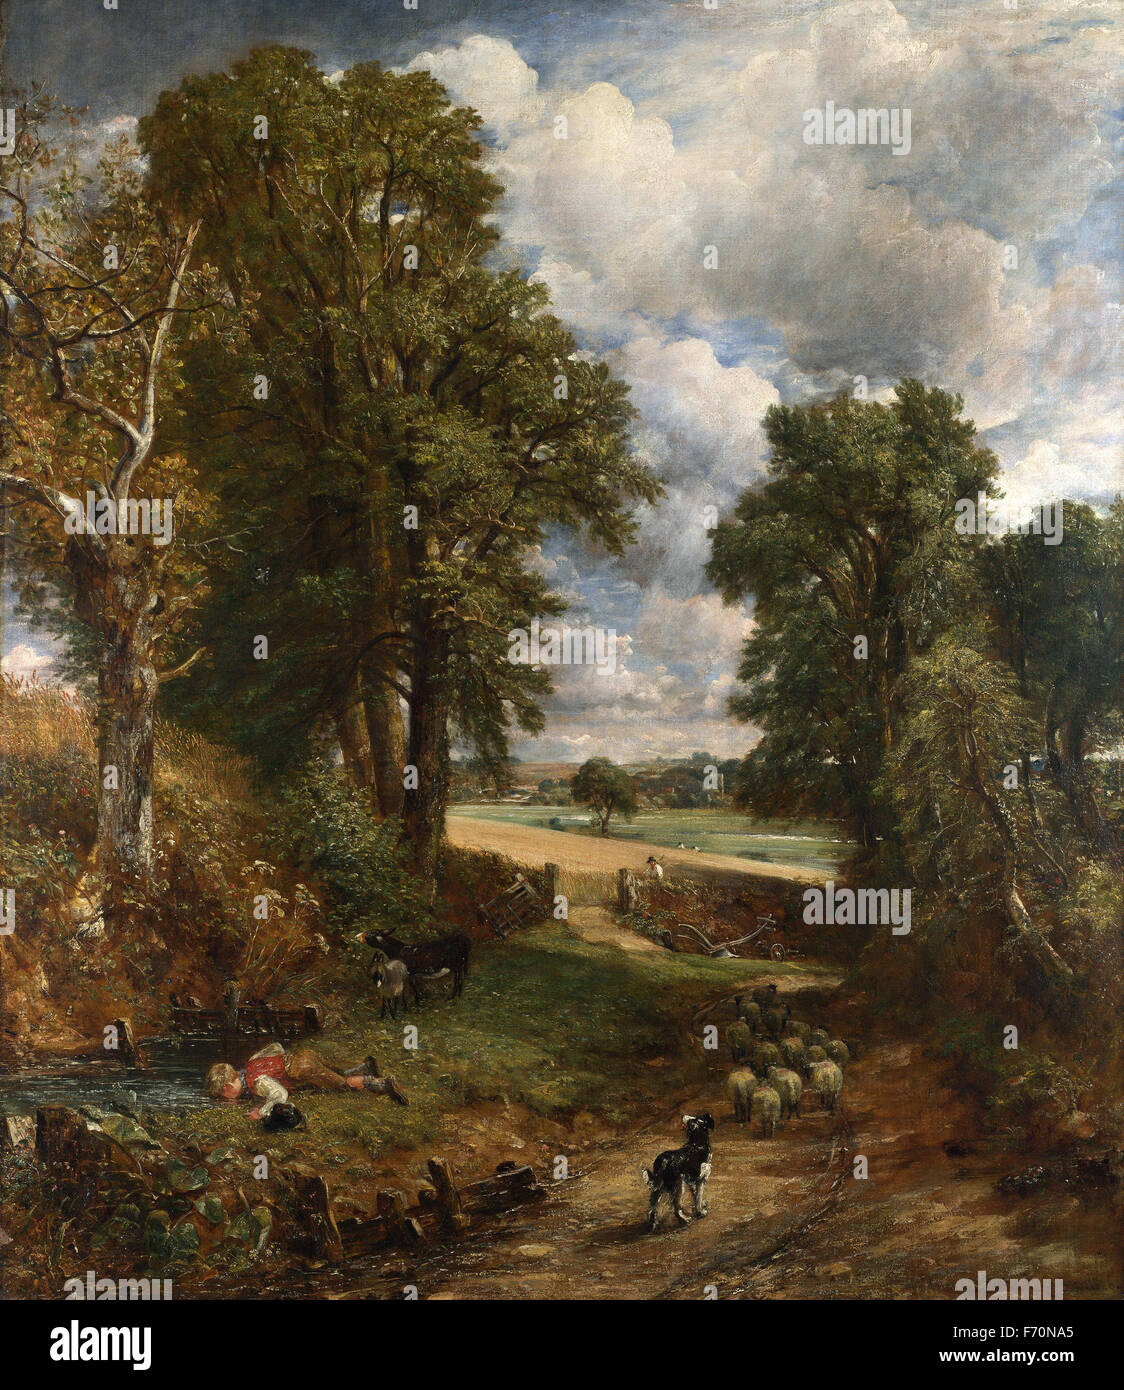 John Constable - The Cornfield - Stock Image